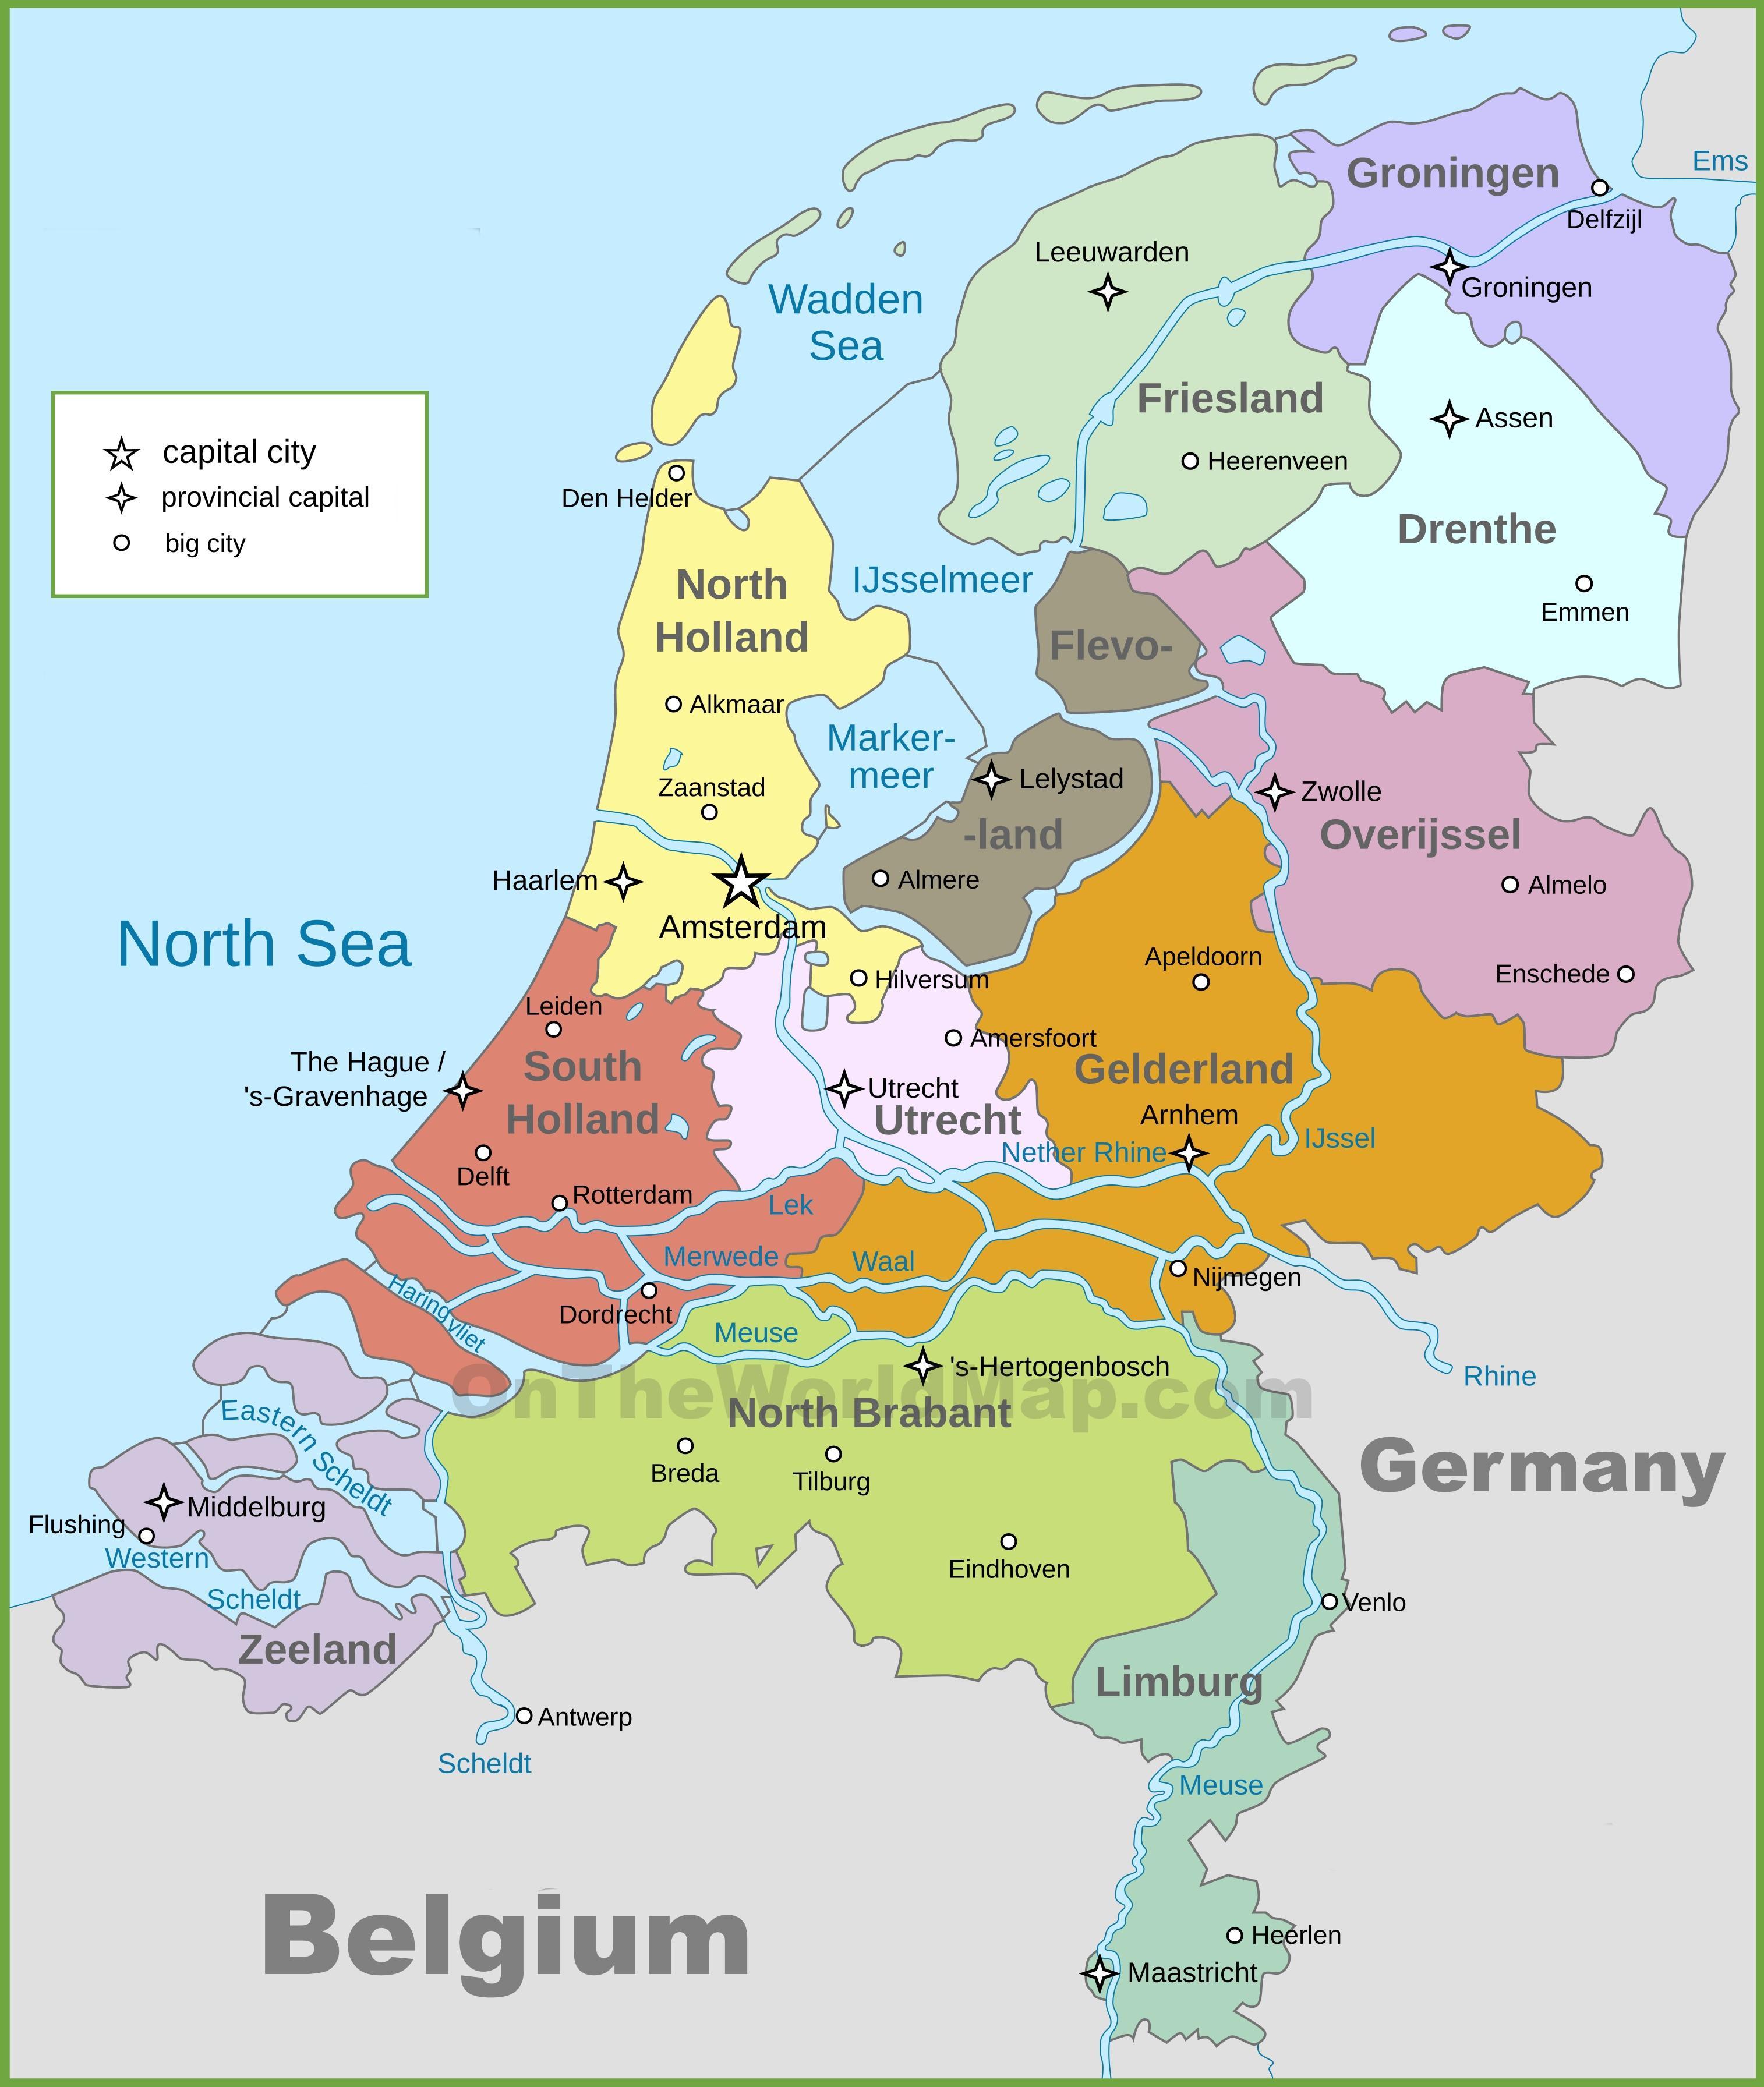 Cartina Olanda Politica.Mappa Politica Di Olanda Cartina Politica Dei Paesi Bassi Europa Occidentale Europa